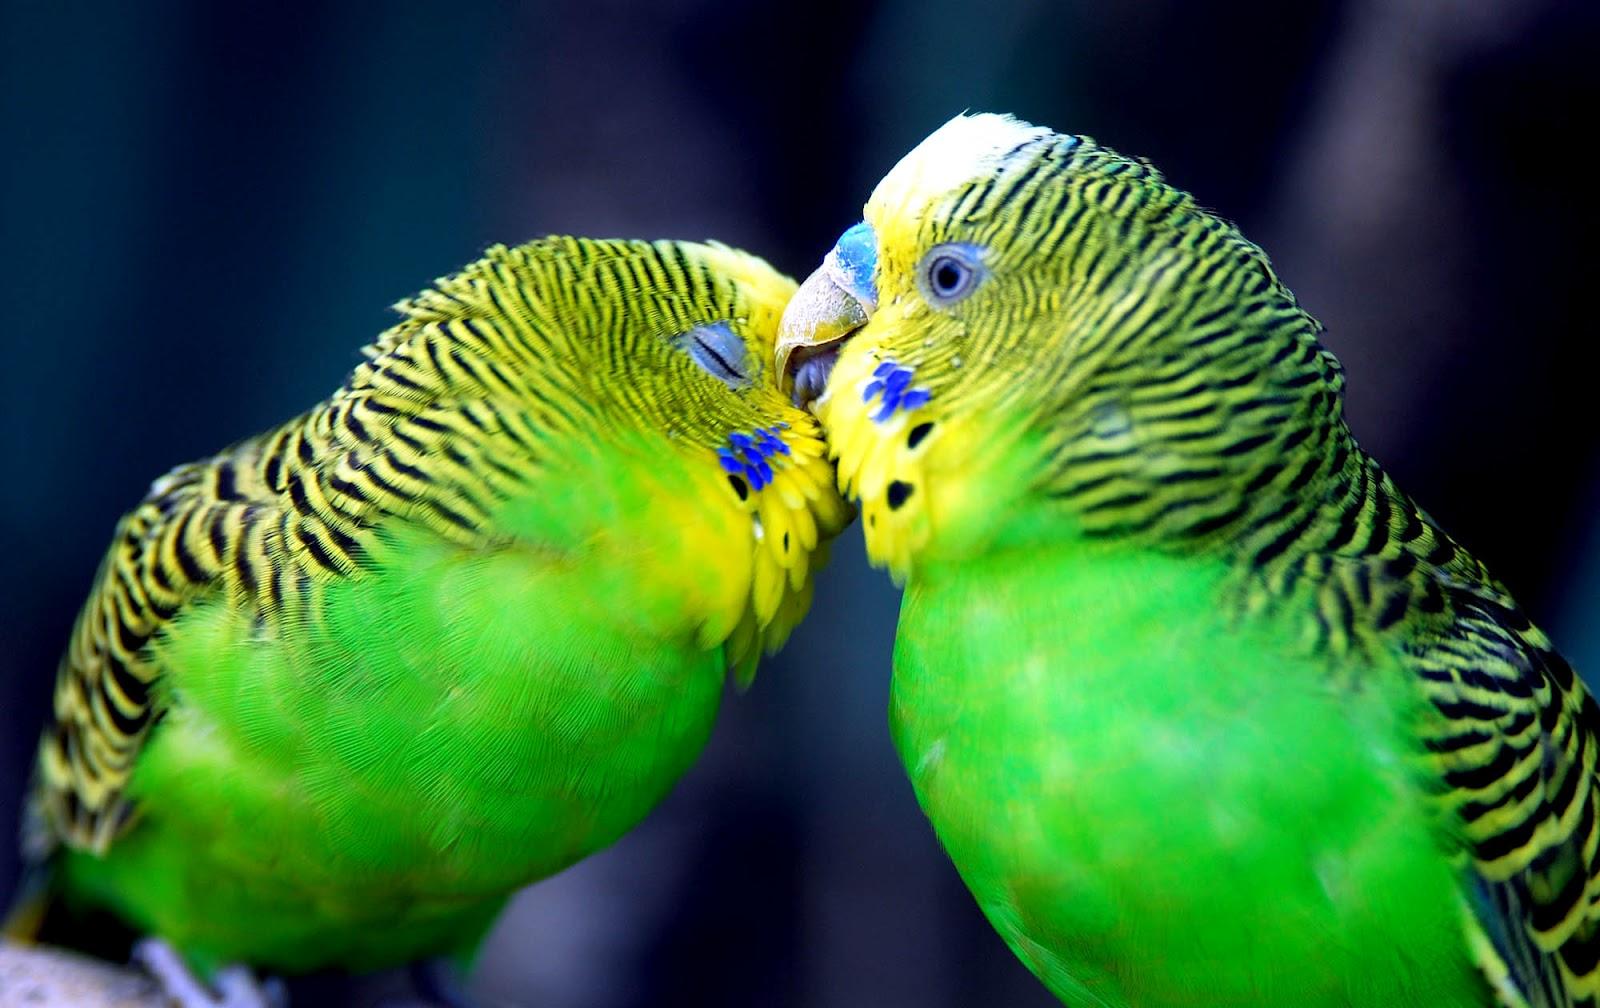 http://1.bp.blogspot.com/-kUOT9lfNhww/UDx8iiSM7VI/AAAAAAAAAZU/C3NFJW8CYwo/s1600/49581-beautiful-birds-cute-parrots.jpg